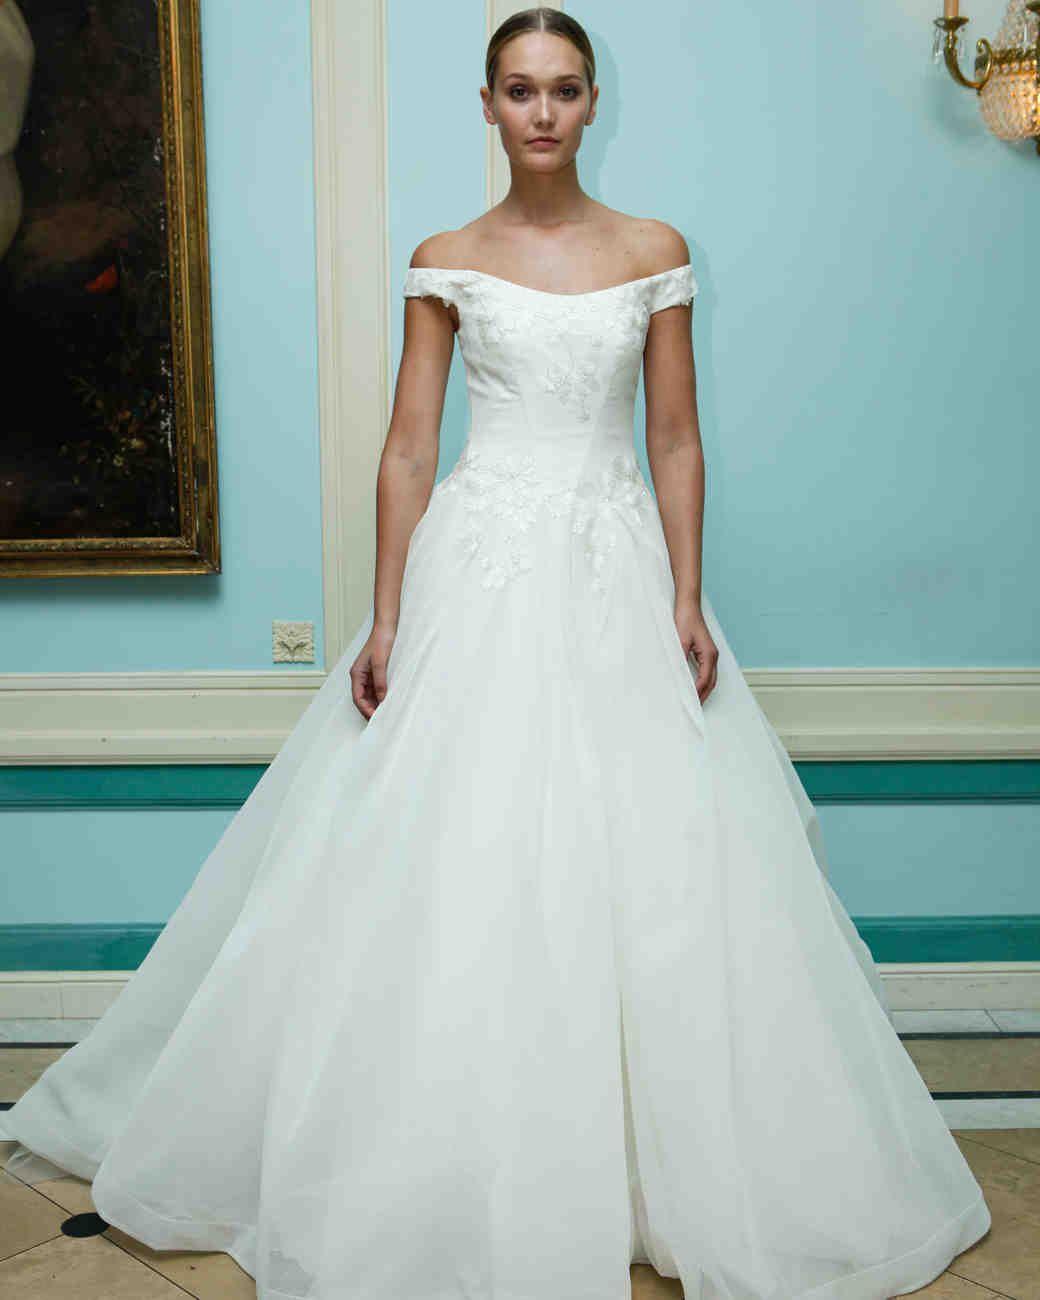 2019 Zac Posen Wedding Dresses - Dressy Dresses for Weddings Check ...